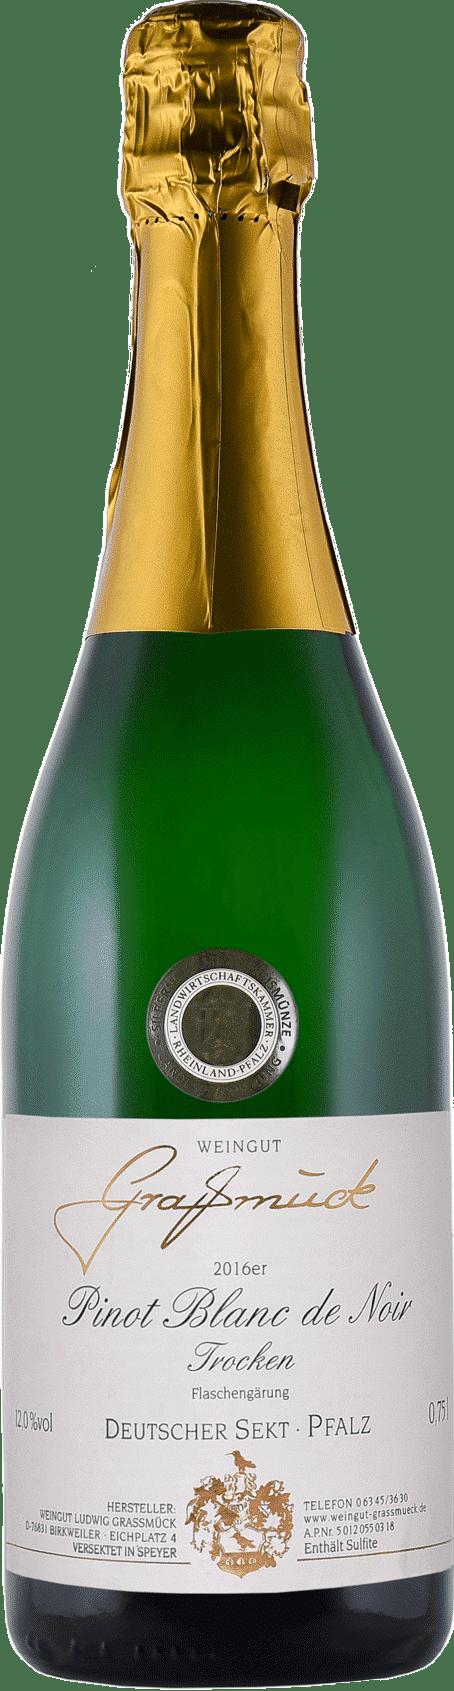 Weingut Ludwig Graßmück, Simon Graßmück, Pinot Blanc de Noir Sekt, trocken